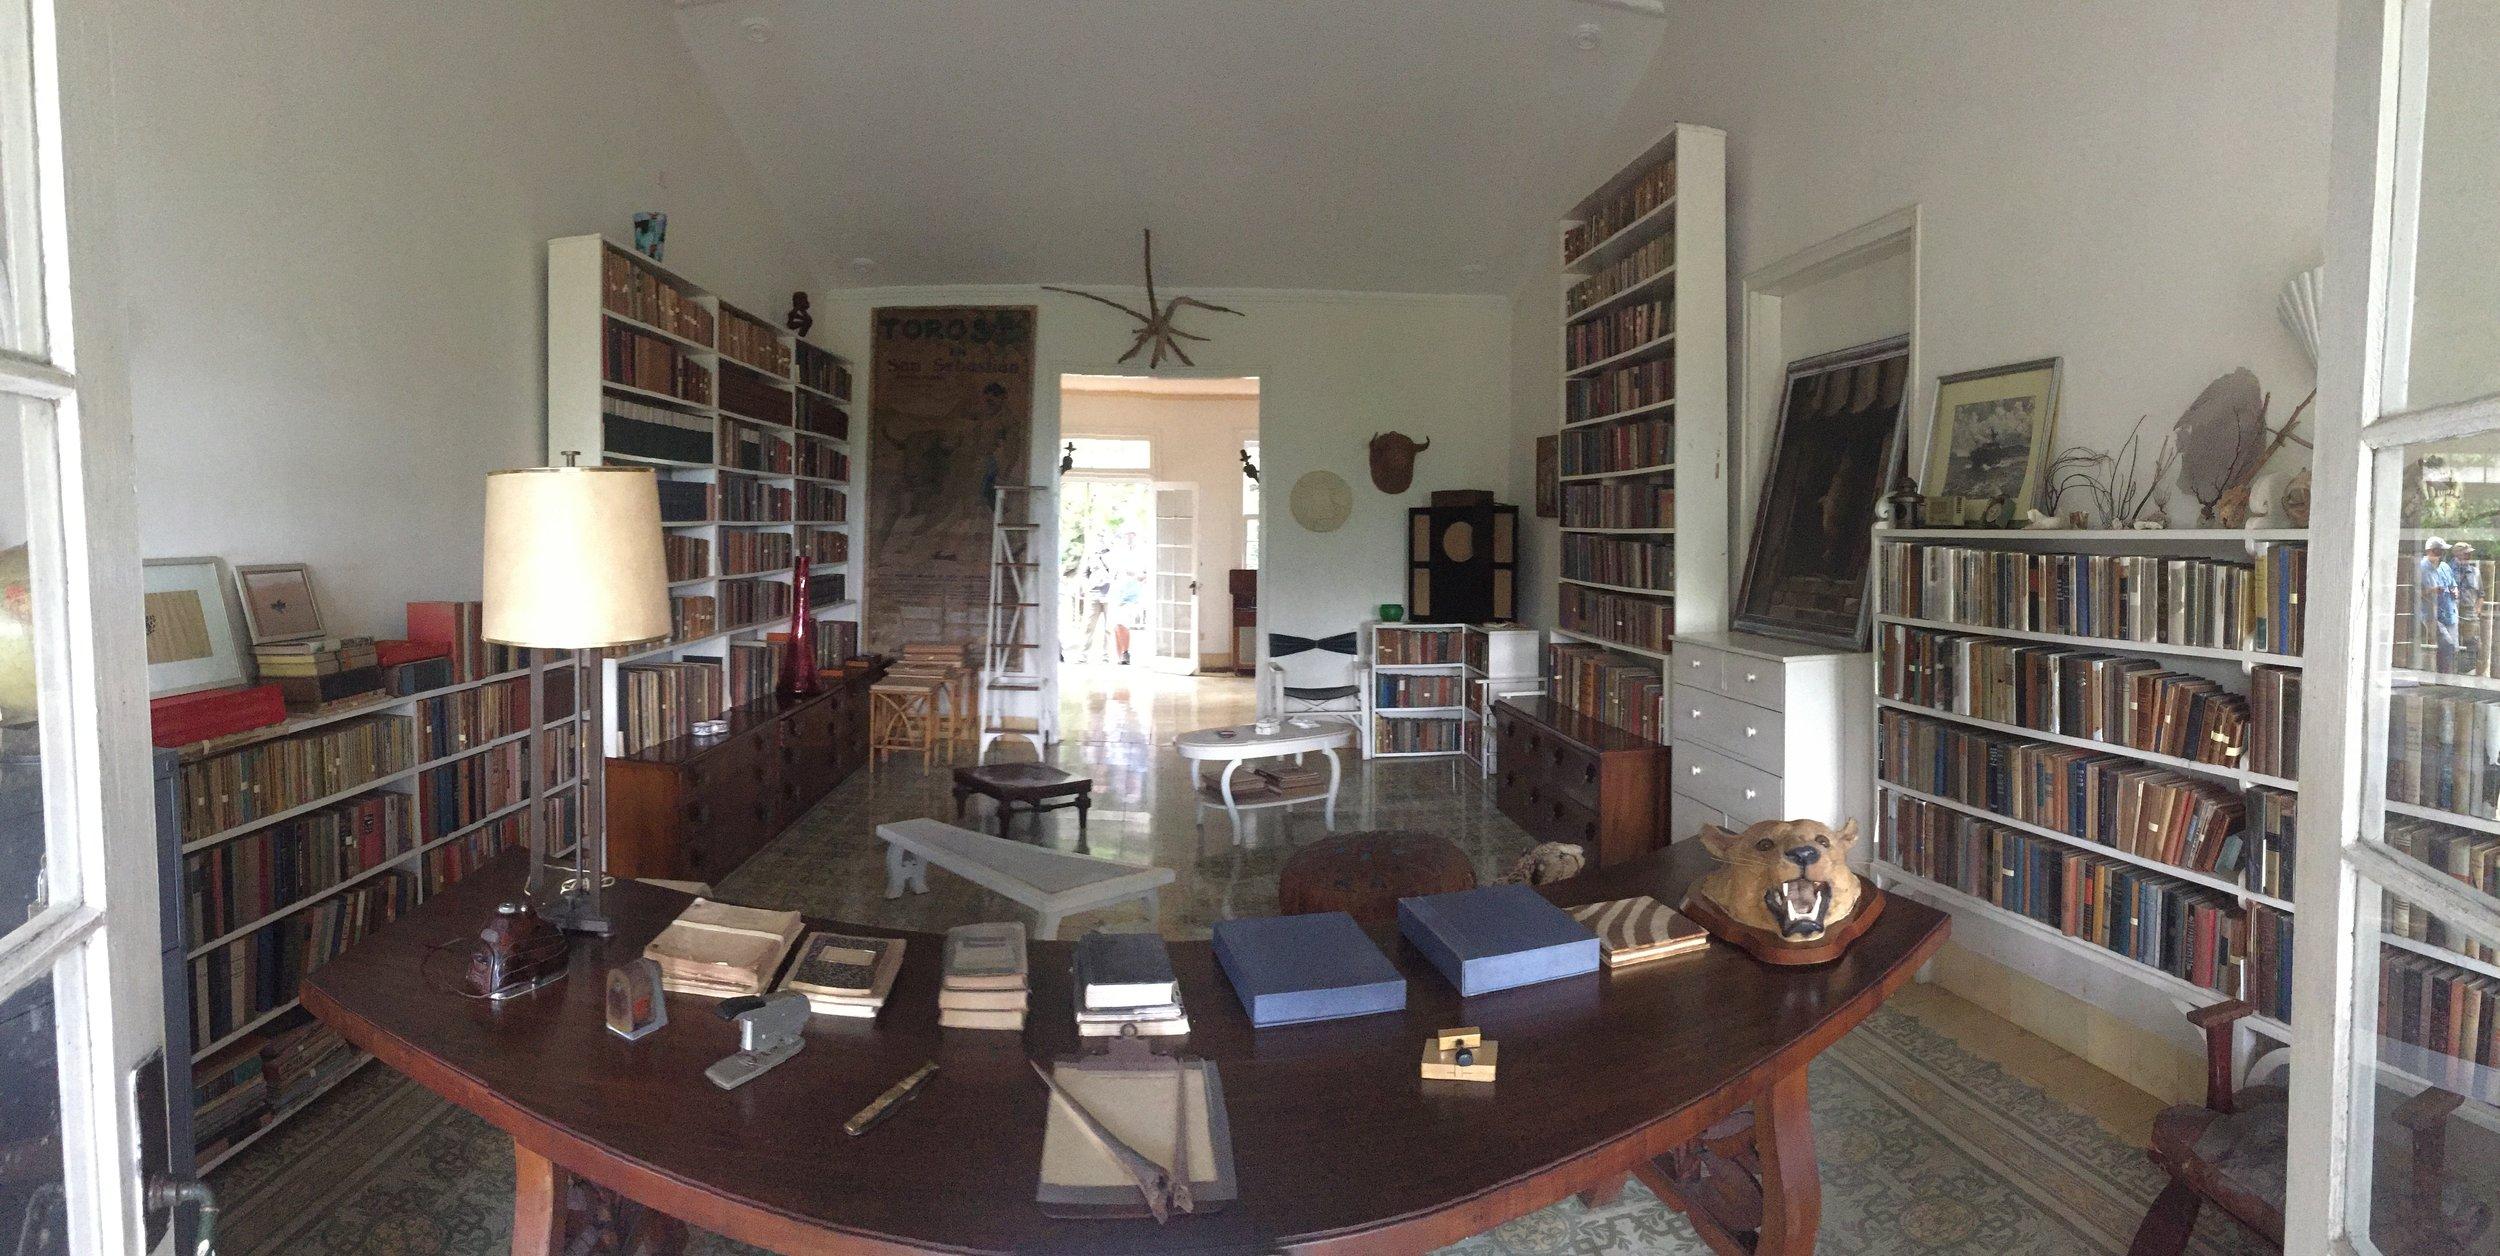 The interior of Finca Vigía, Hemingway's home outside Havana. Many books, many guns, many big game trophies.